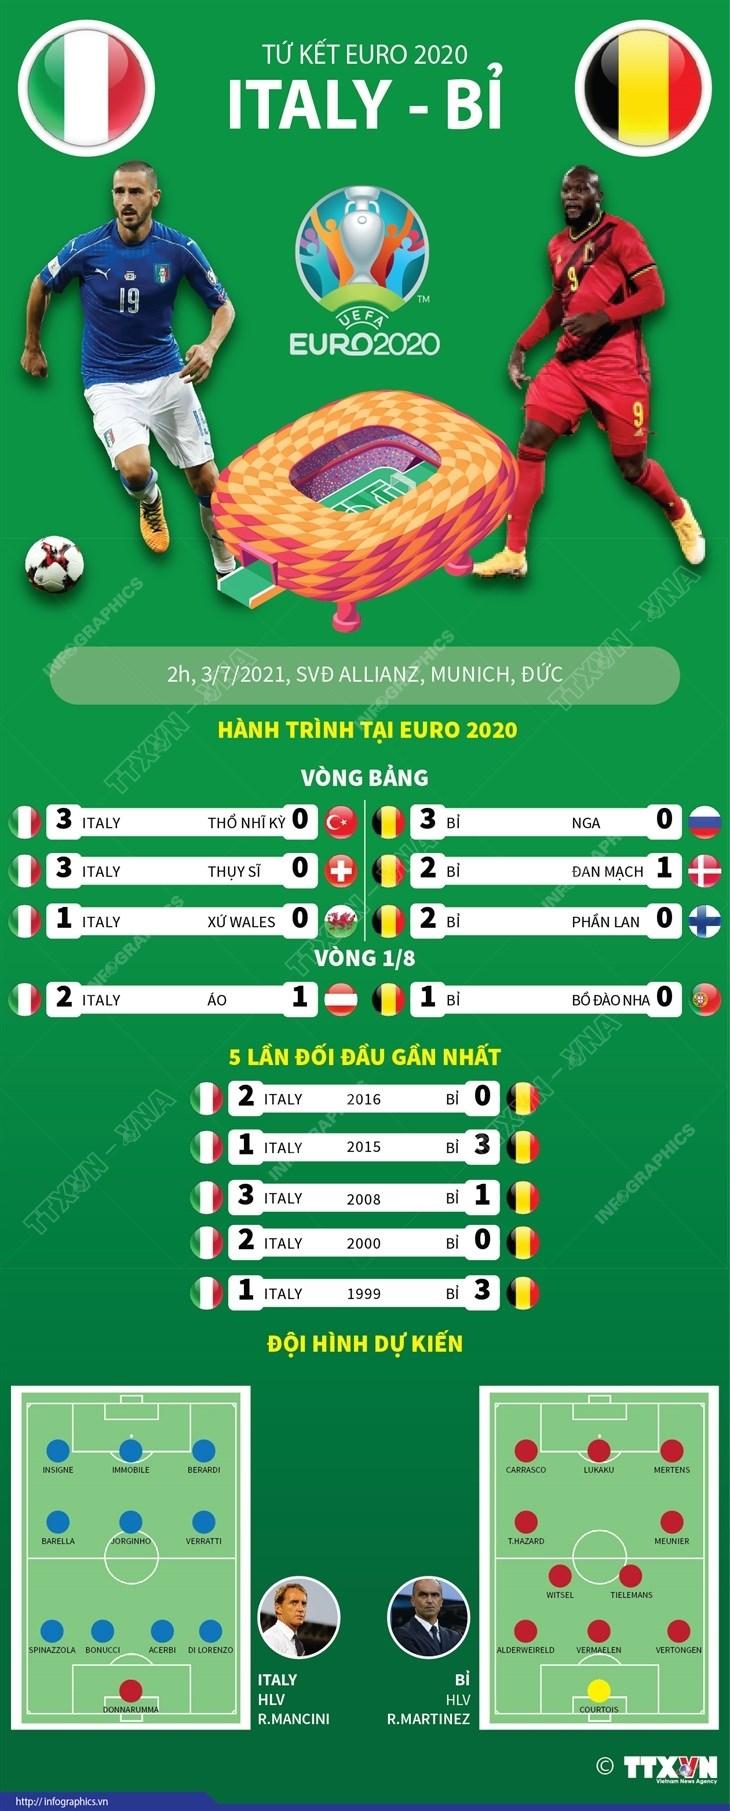 [Infographics] Tu ket EURO 2020: Tuong quan luc luong tran Italy-Bi hinh anh 1